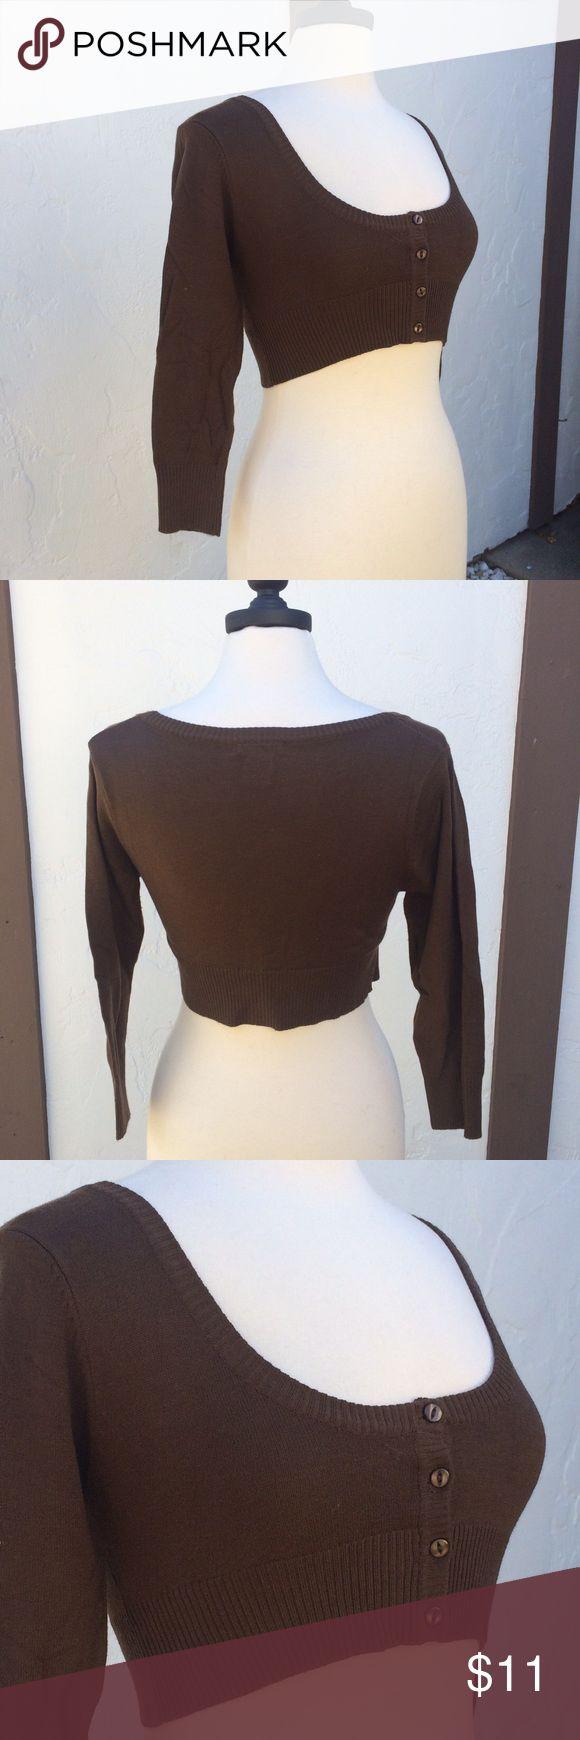 Body Central Cropped Sweater Preloved Body Central Cropped Sweater - 80% Acrylic 20% Nylon Body Central Sweaters